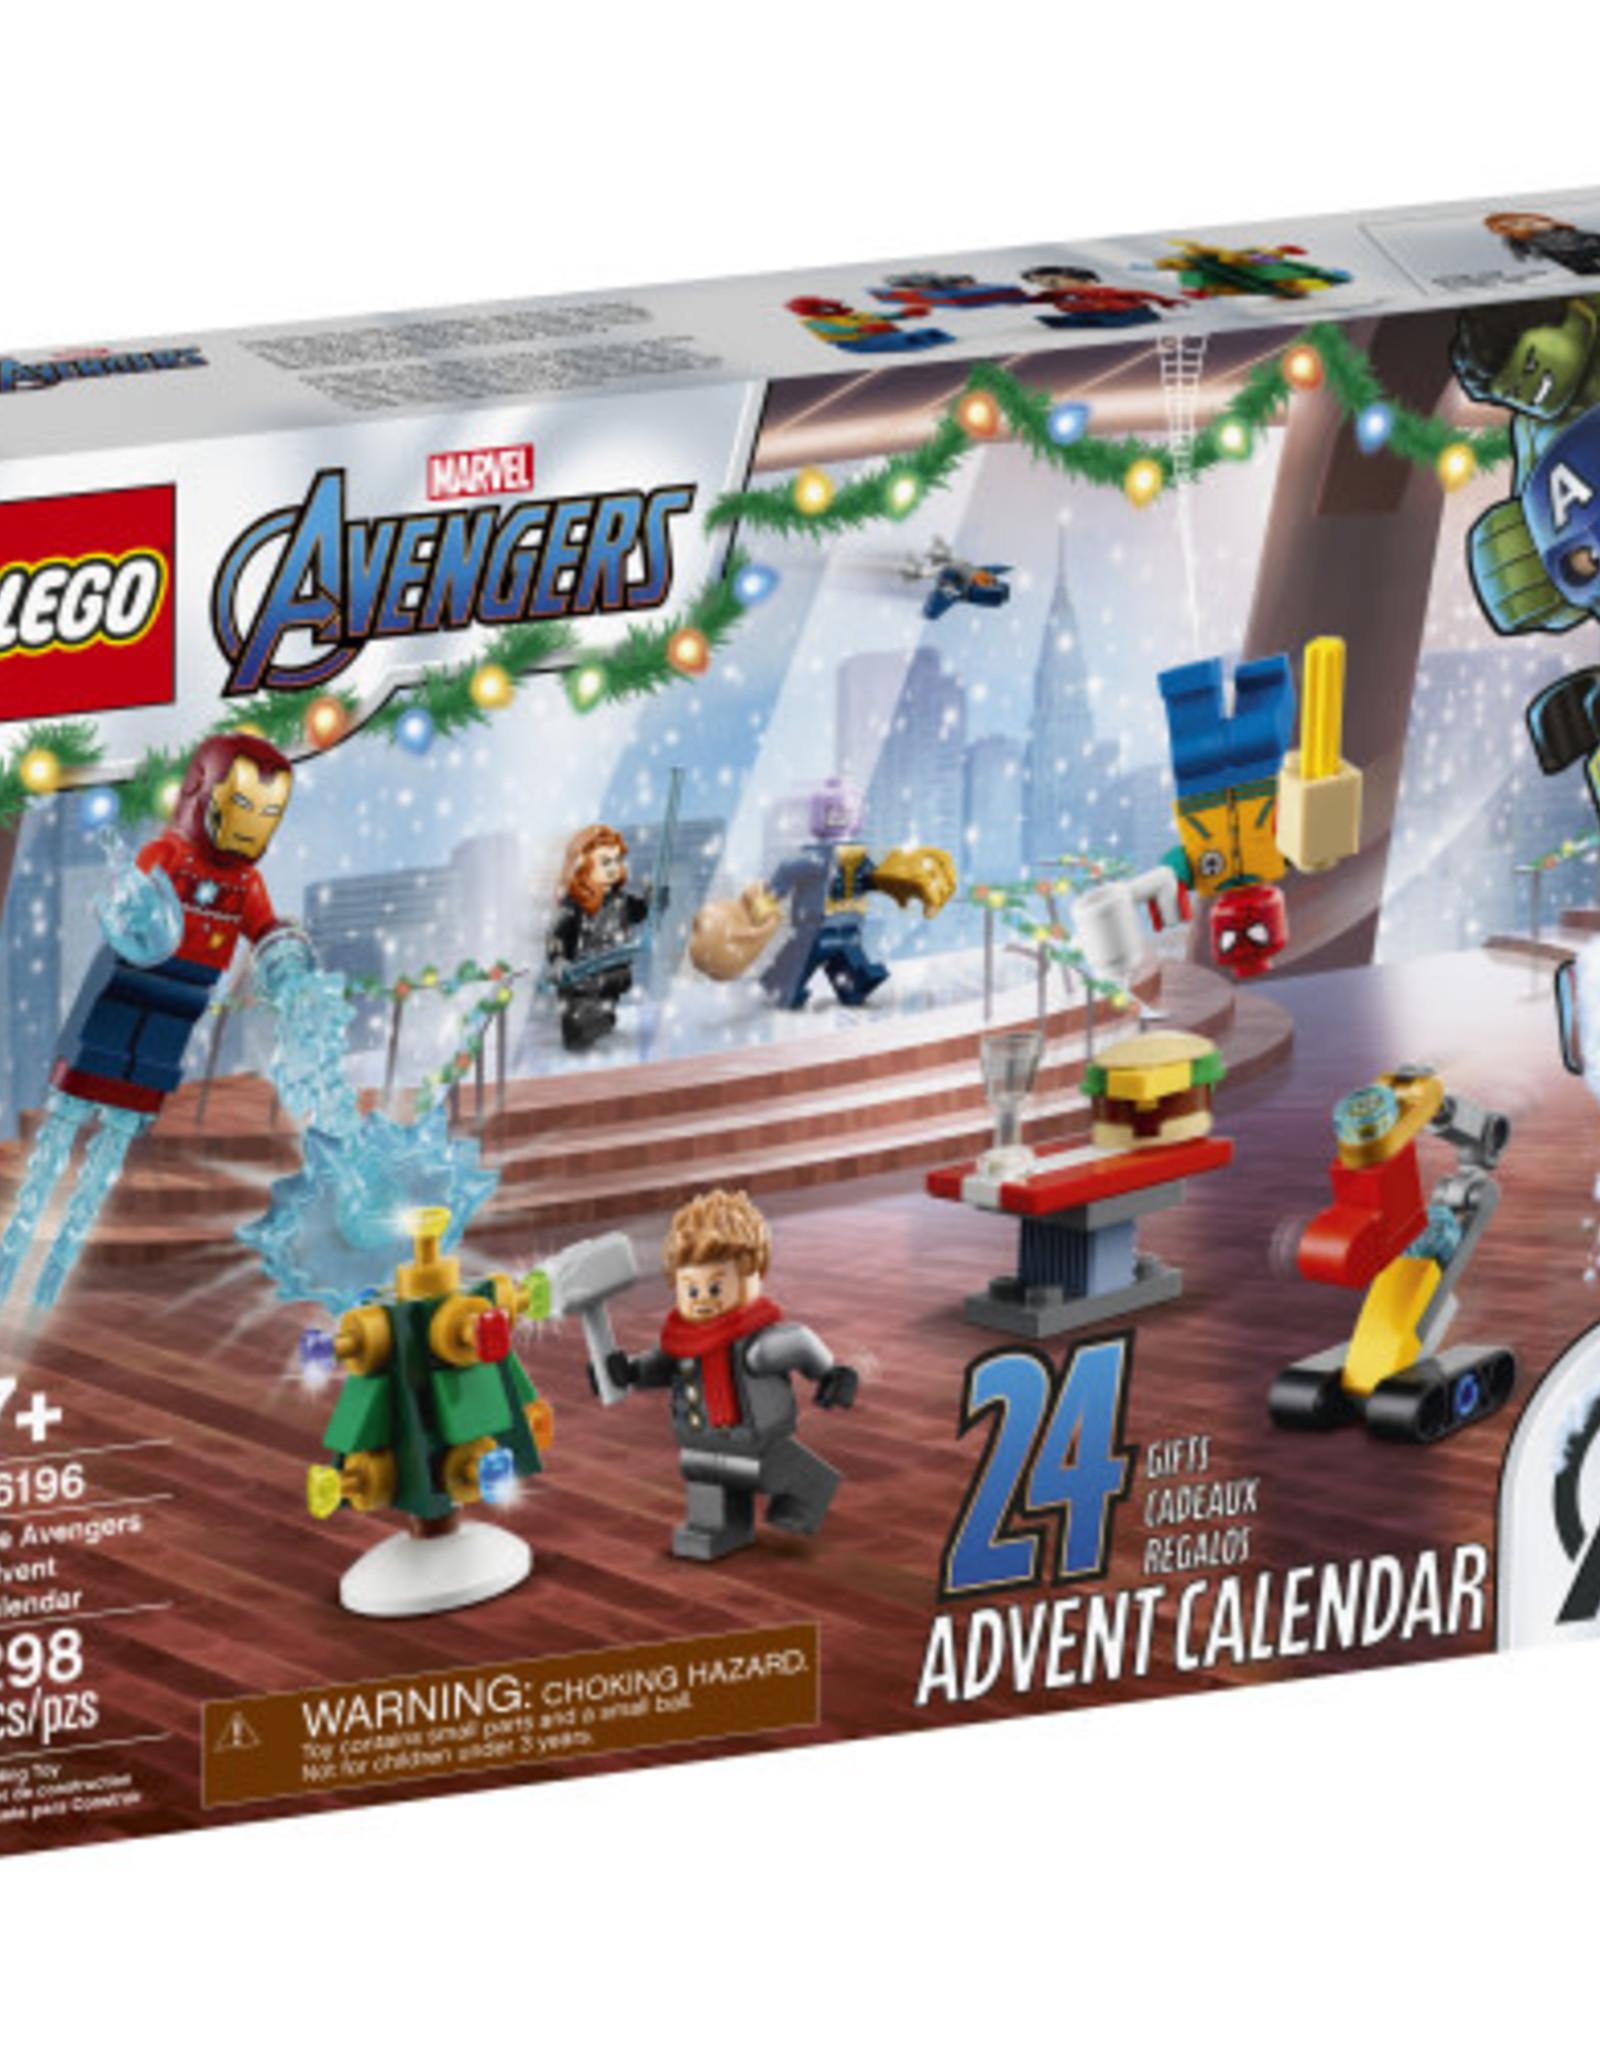 LEGO 76196 The Avengers Advent Calendar V39